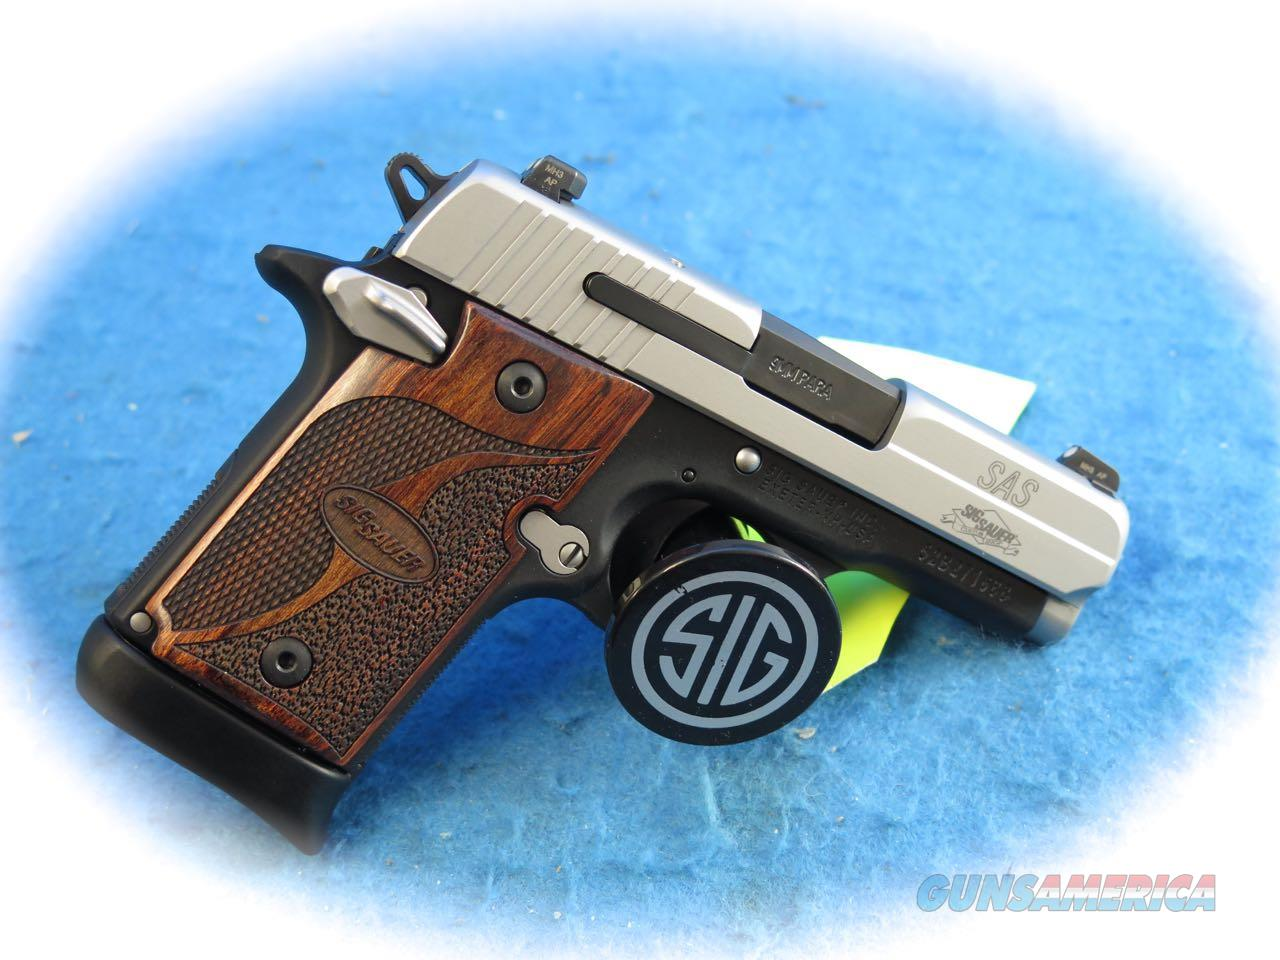 Sig Sauer P938 SAS Micro Compact 9mm Pistol Model 938-9-SAS-AMBI **New**  Guns > Pistols > Sig - Sauer/Sigarms Pistols > P938